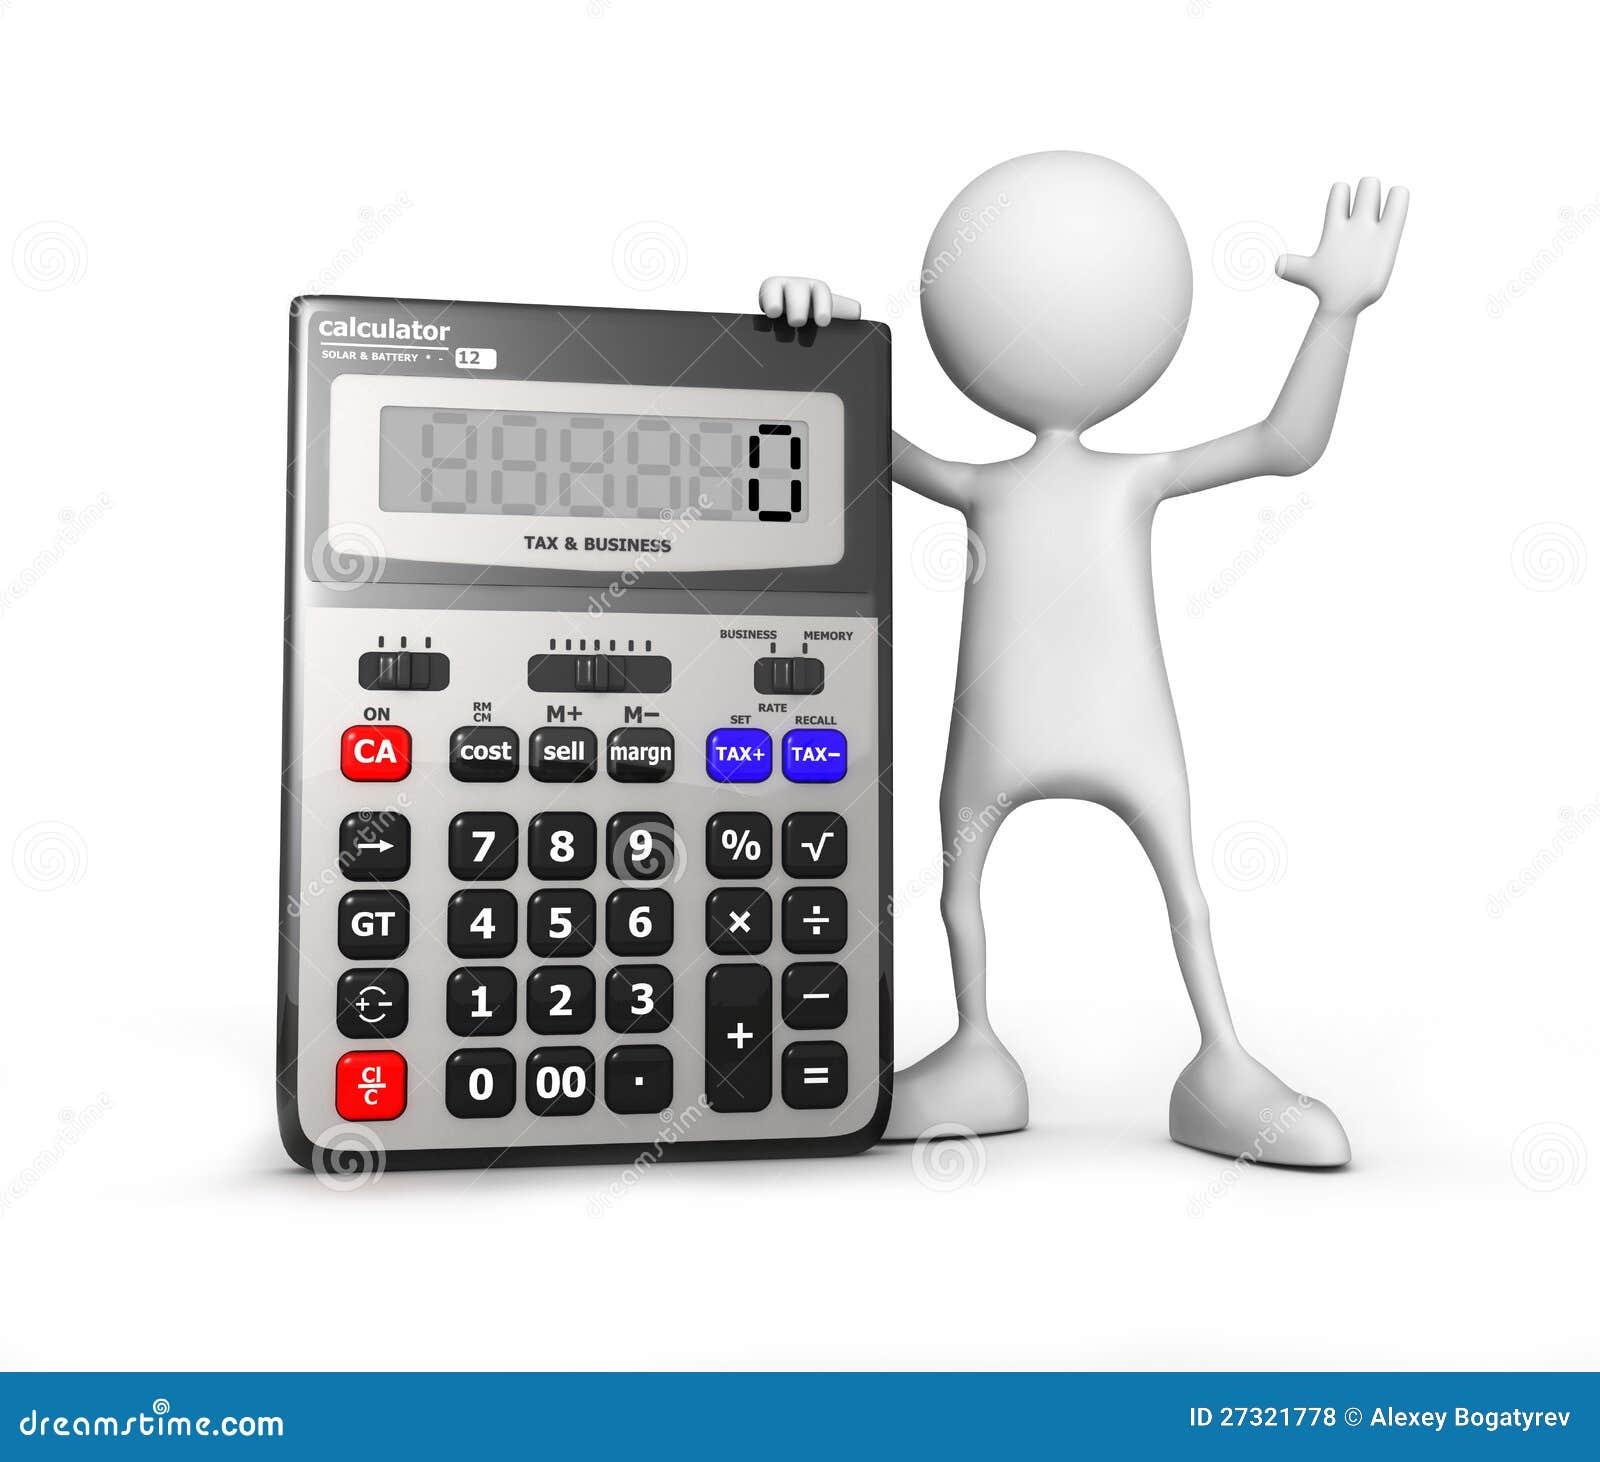 Calculator Royalty Free Stock Photos Image 27321778